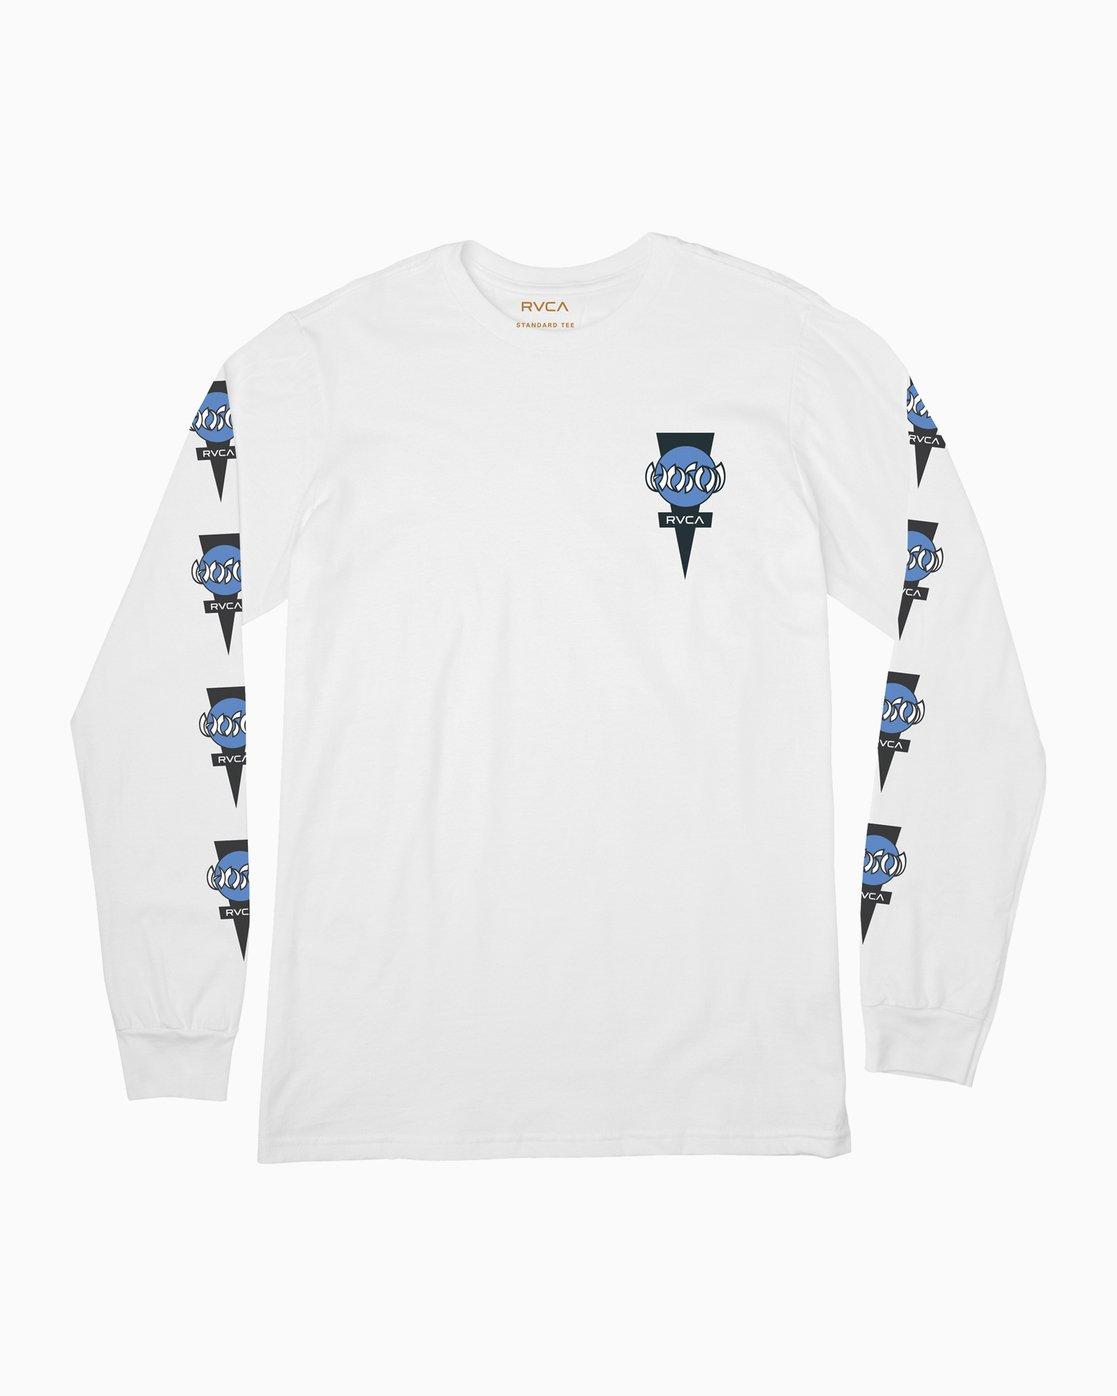 0 Christian Hosoi Long Sleeve T-Shirt White M451SRHS RVCA